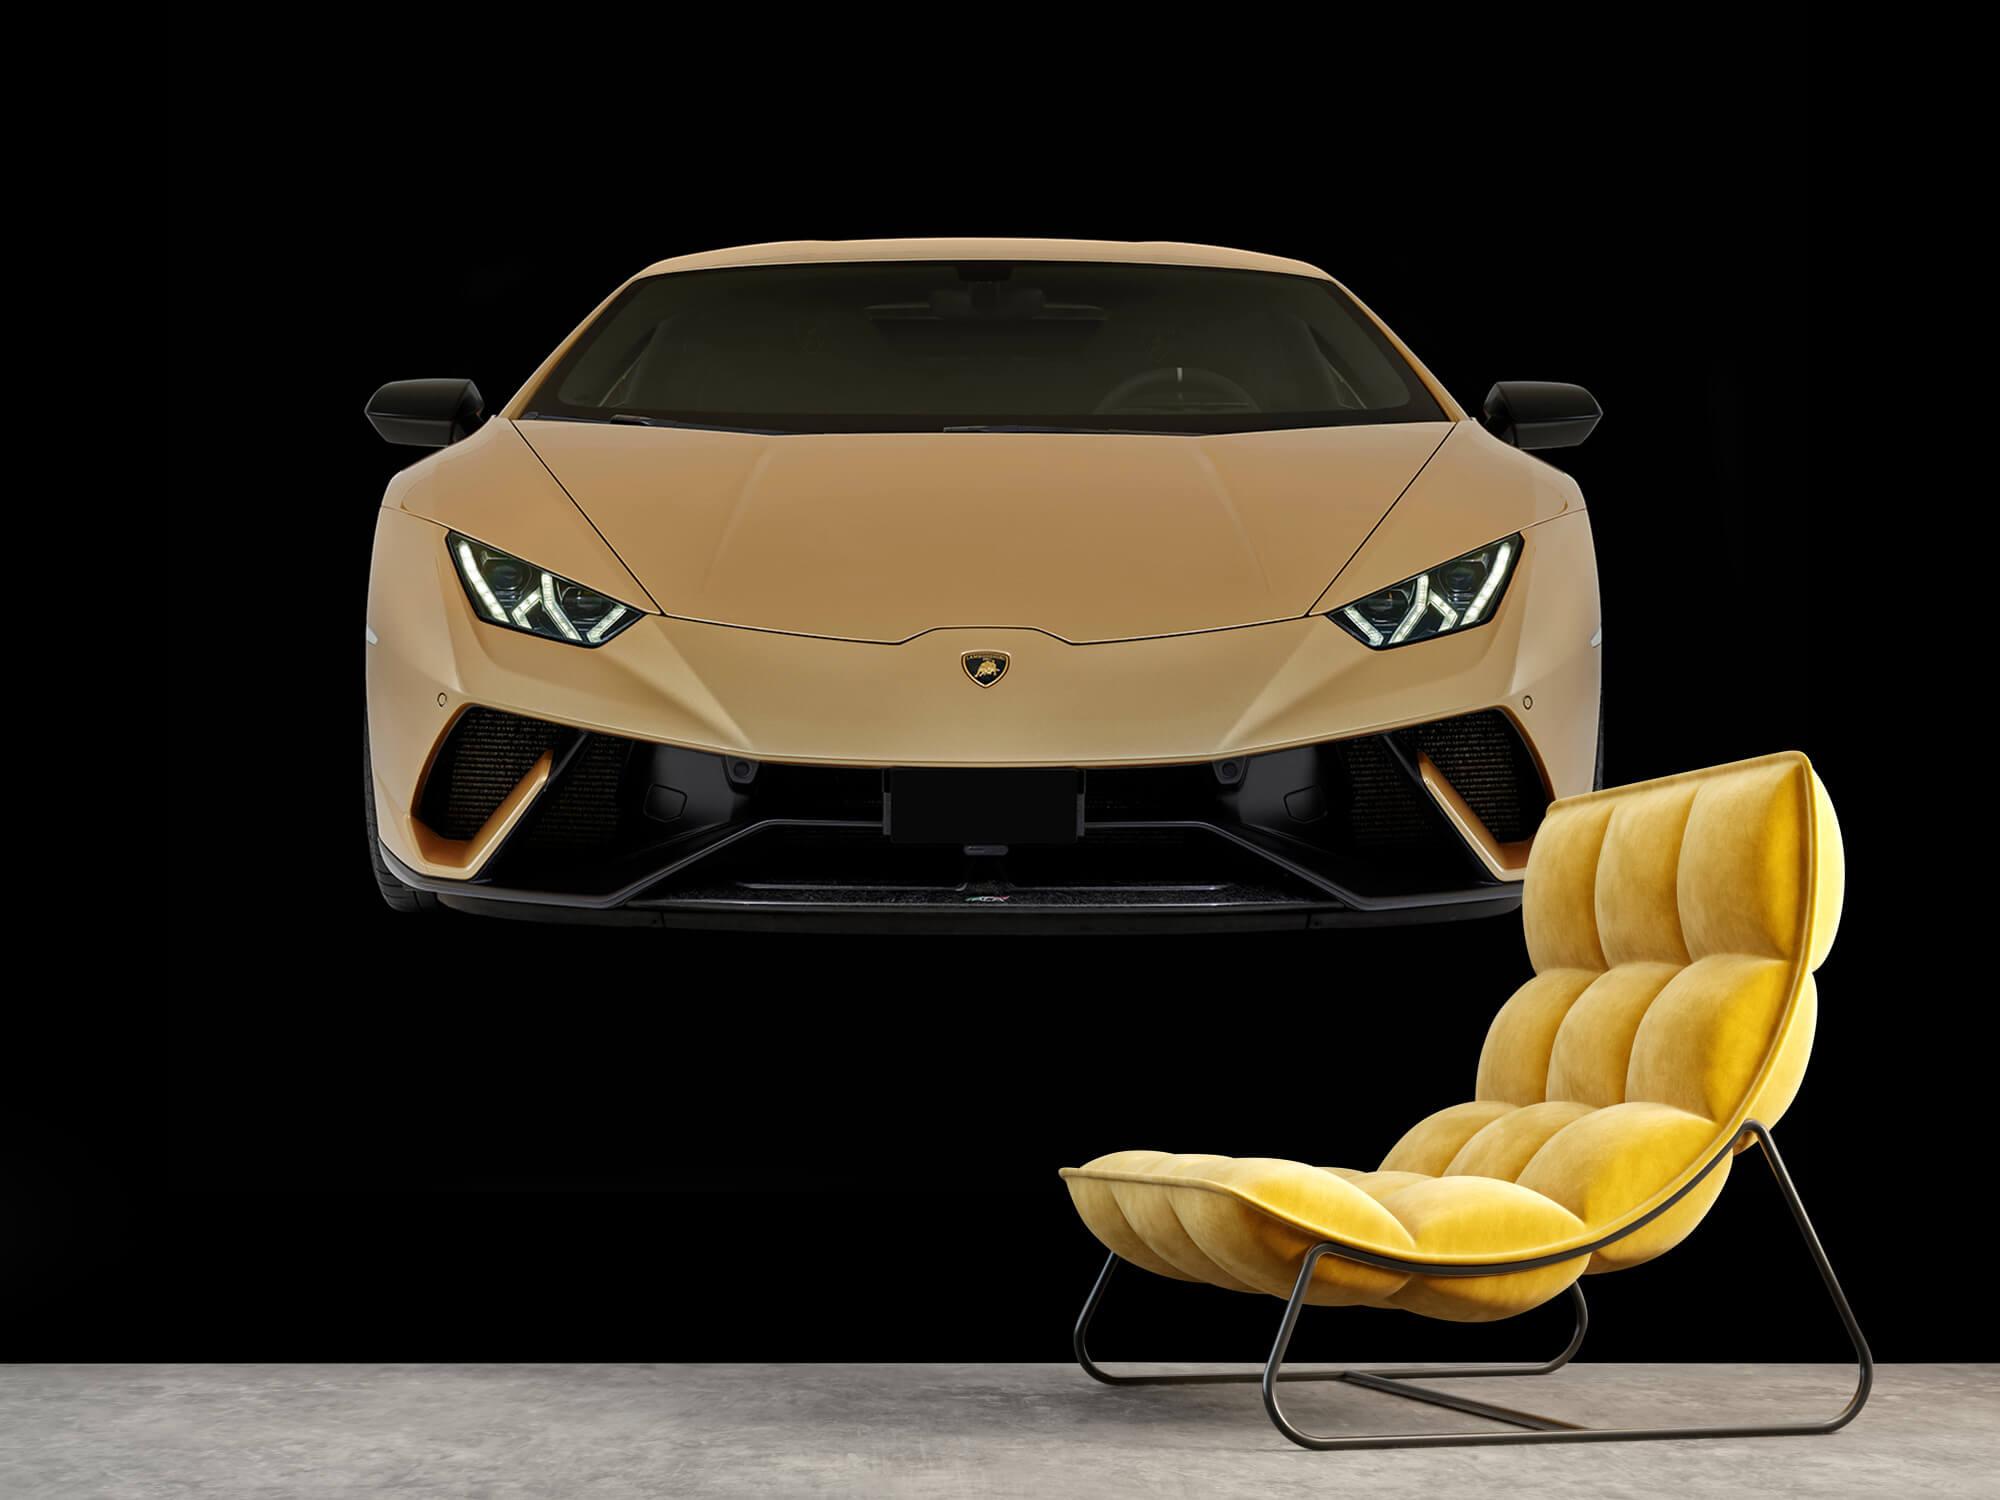 Wallpaper Lamborghini Huracán - Voorkant, zwart 4